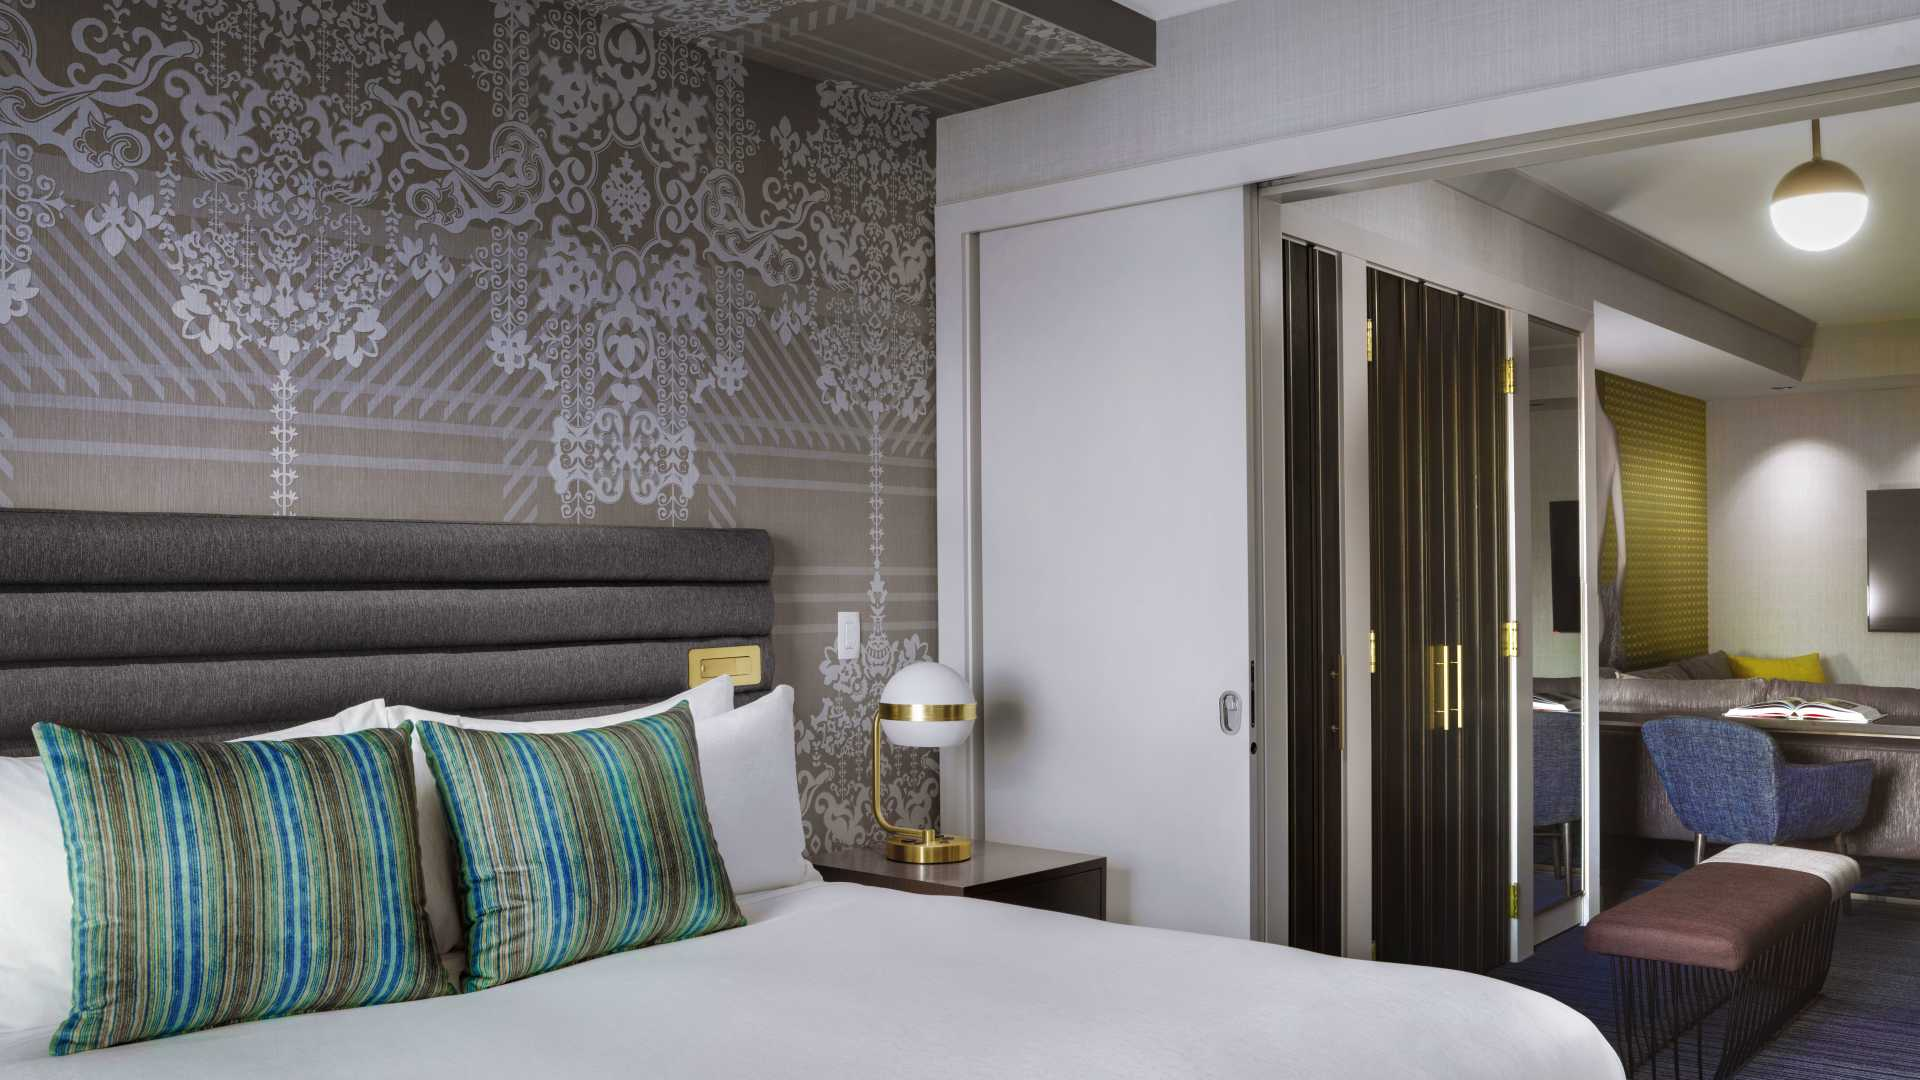 Miraculous Las Vegas Luxury Hotel Terrace One Bedroom The Cosmopolitan Interior Design Ideas Tzicisoteloinfo